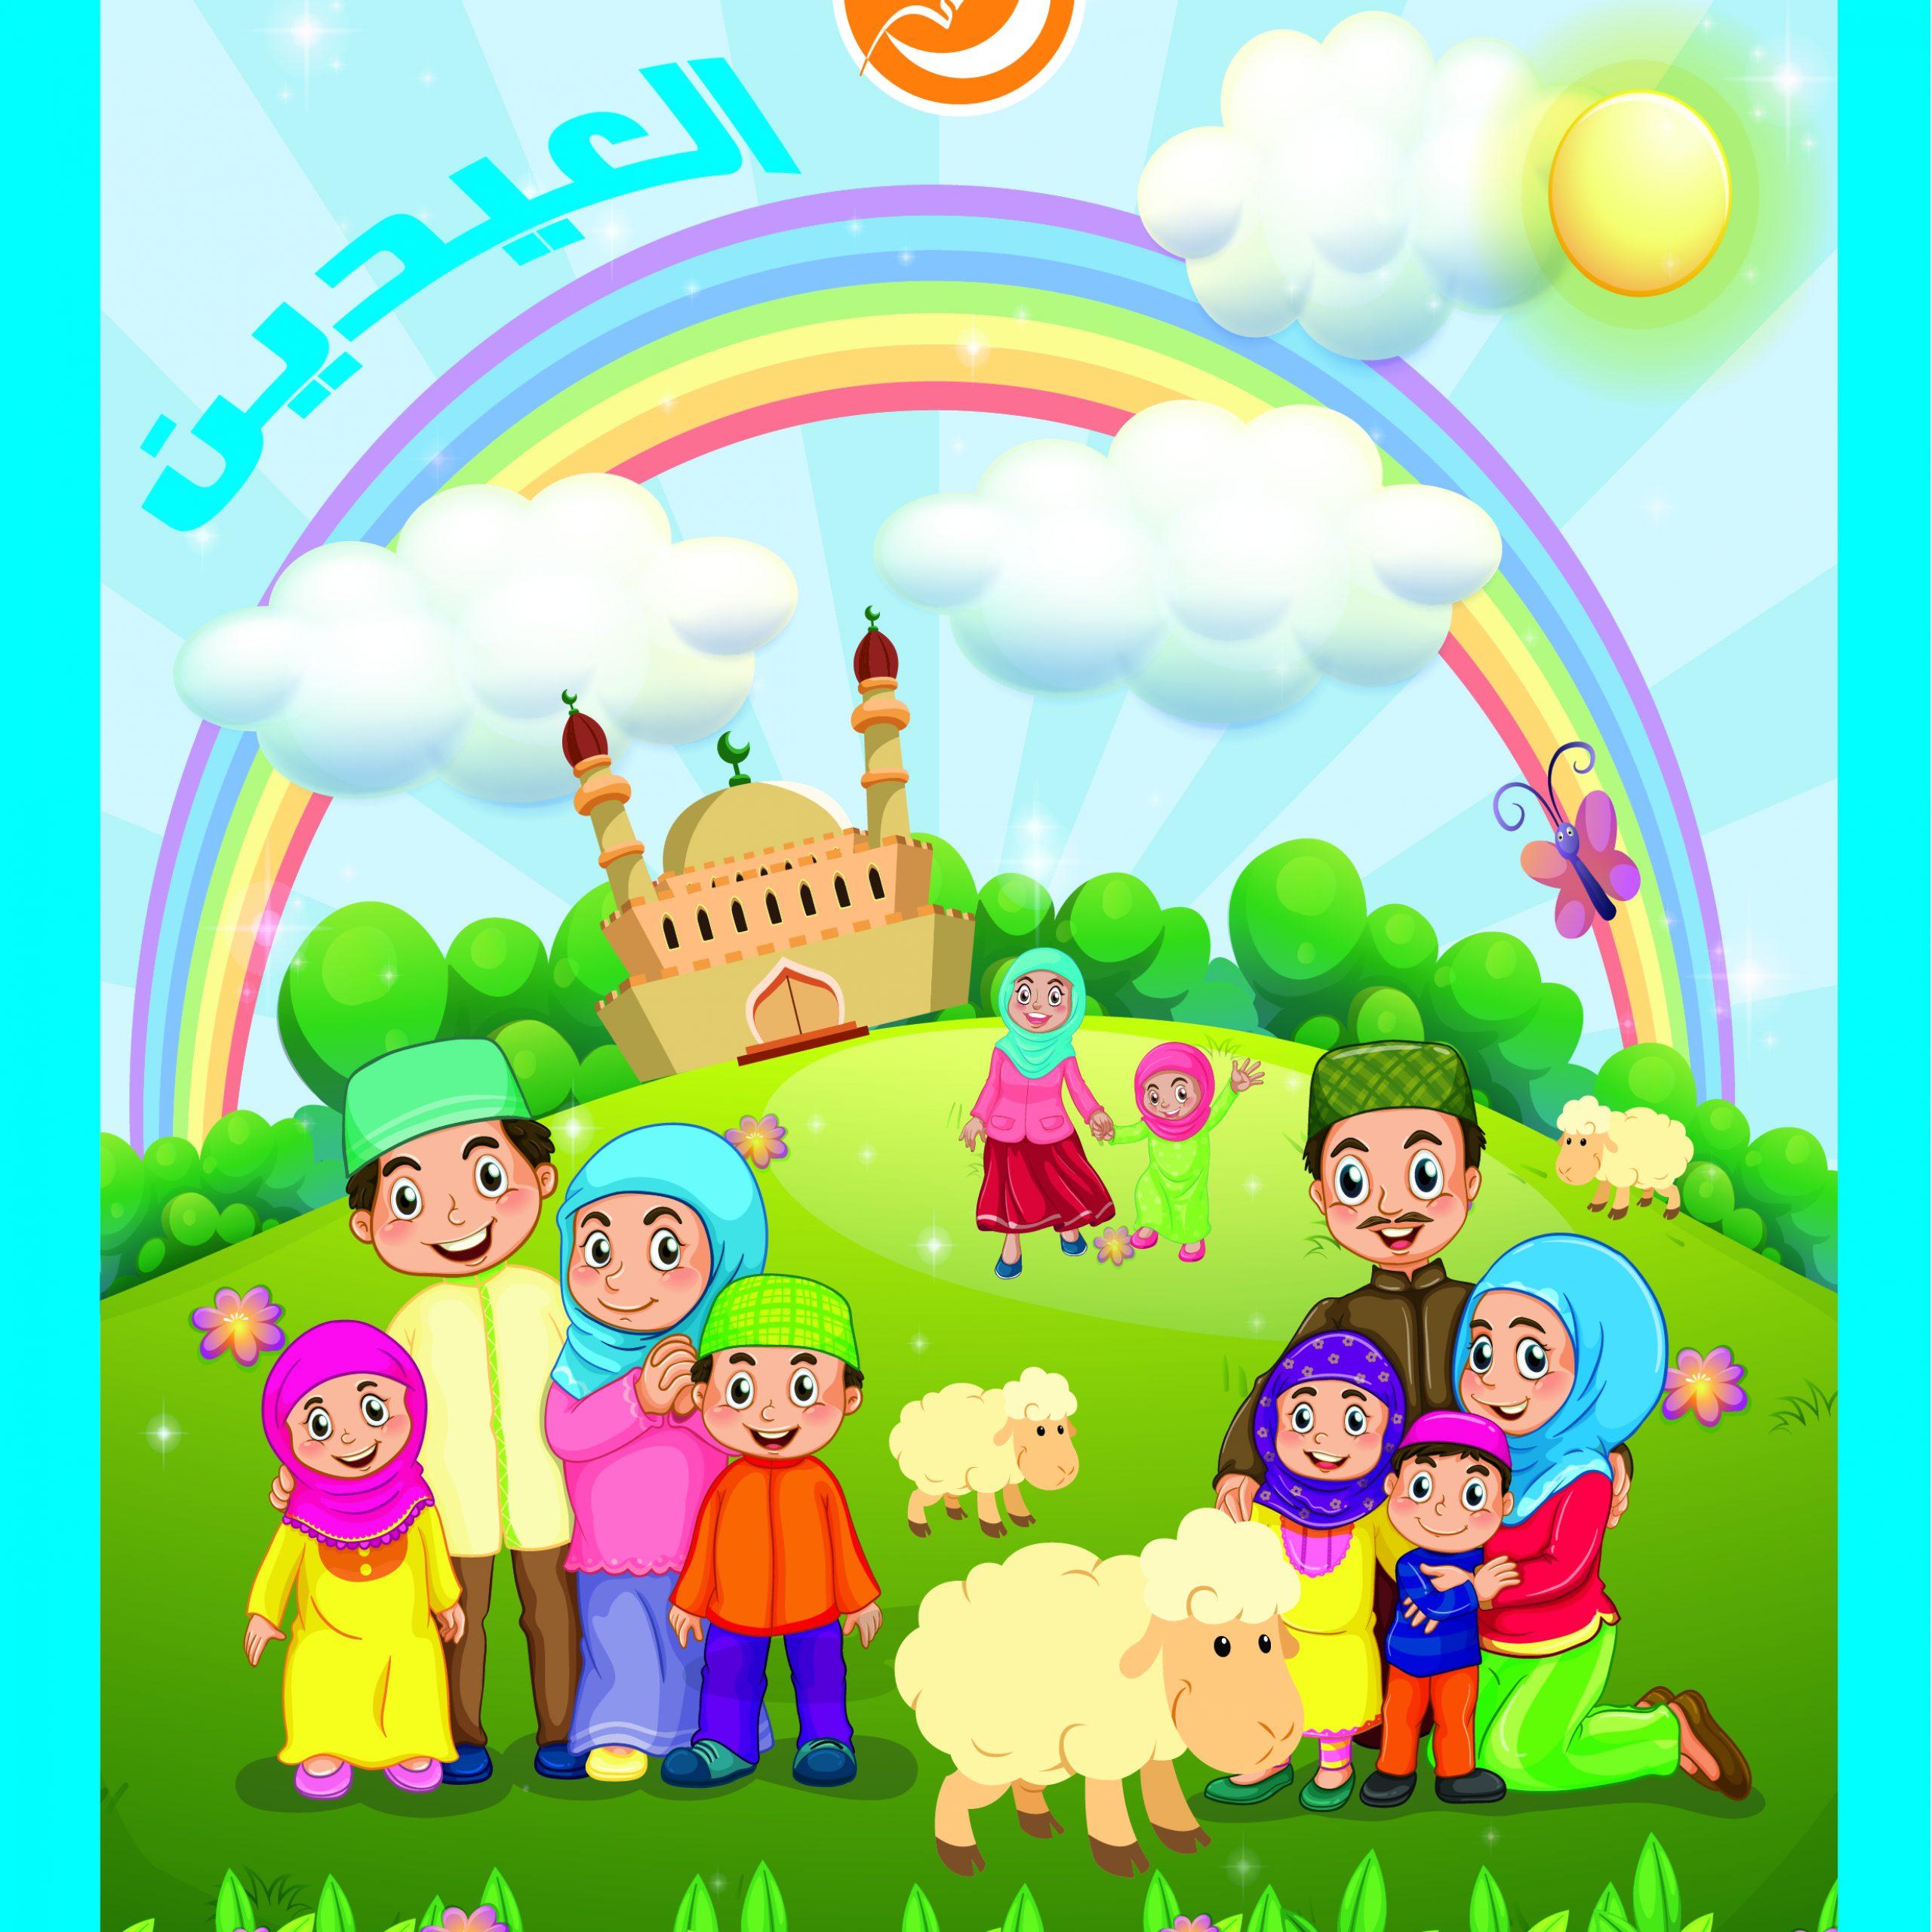 The Eids